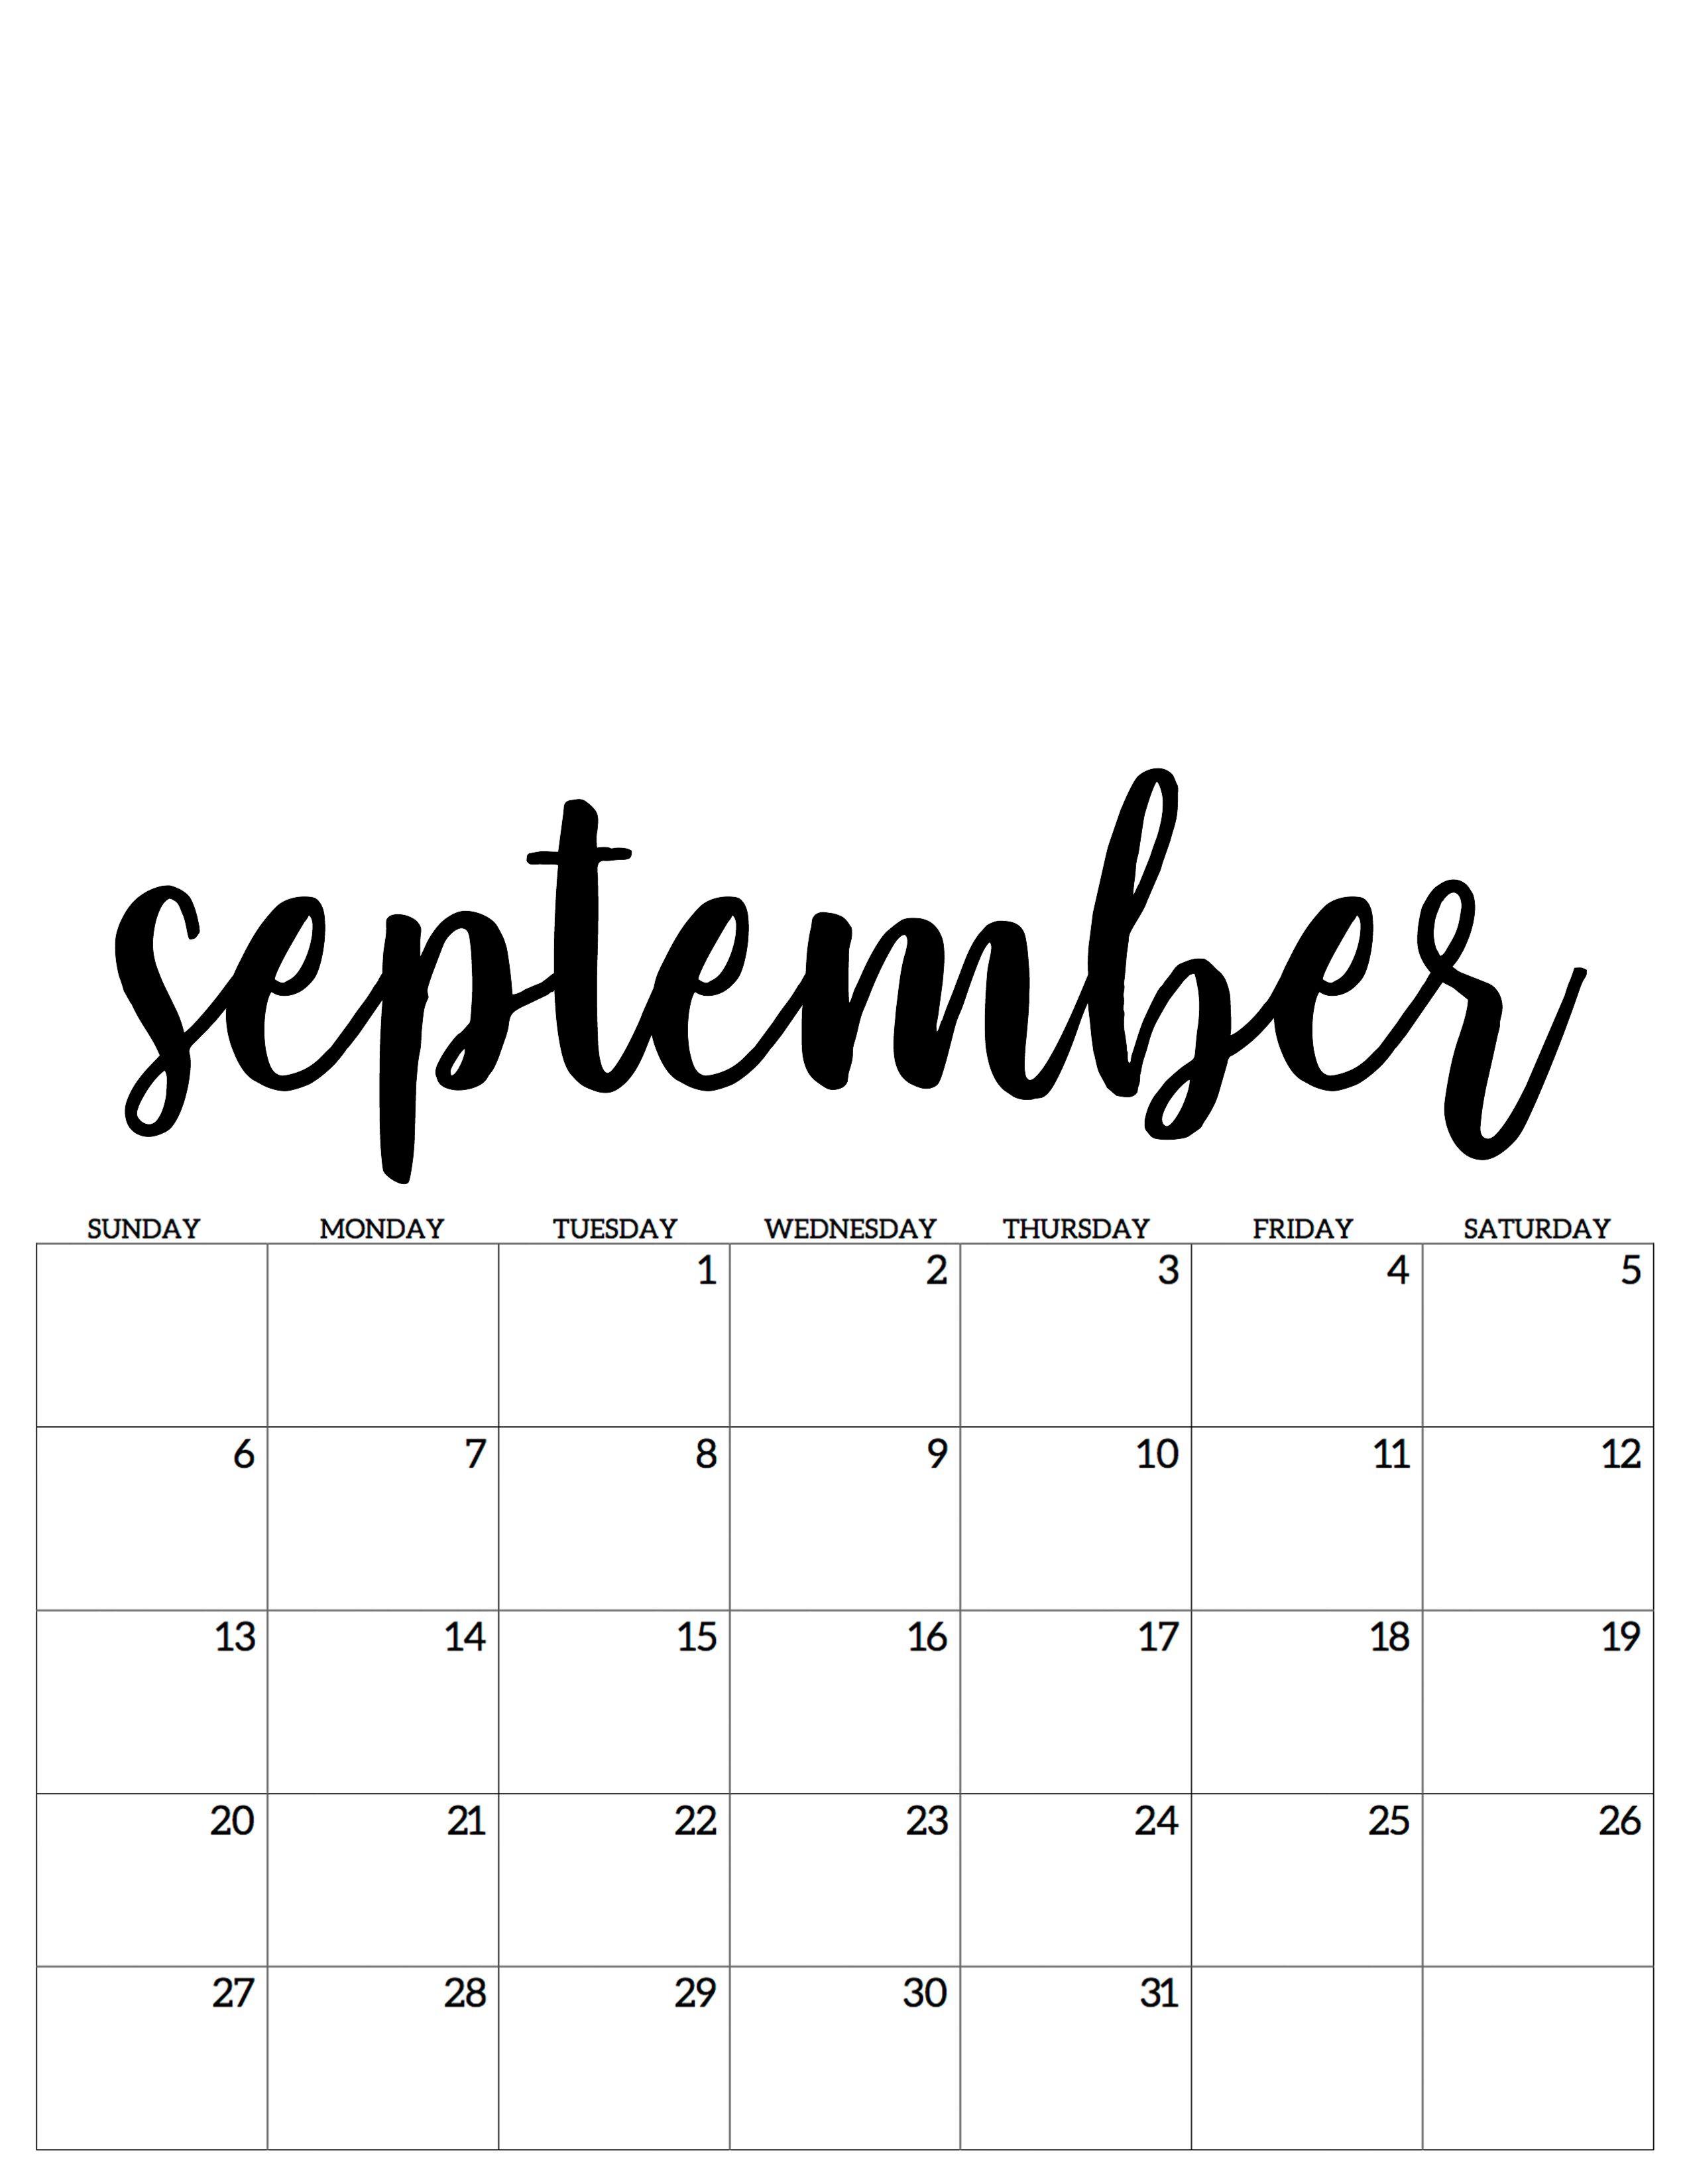 September Kalender Calendar 2019 September Kalender Kalender